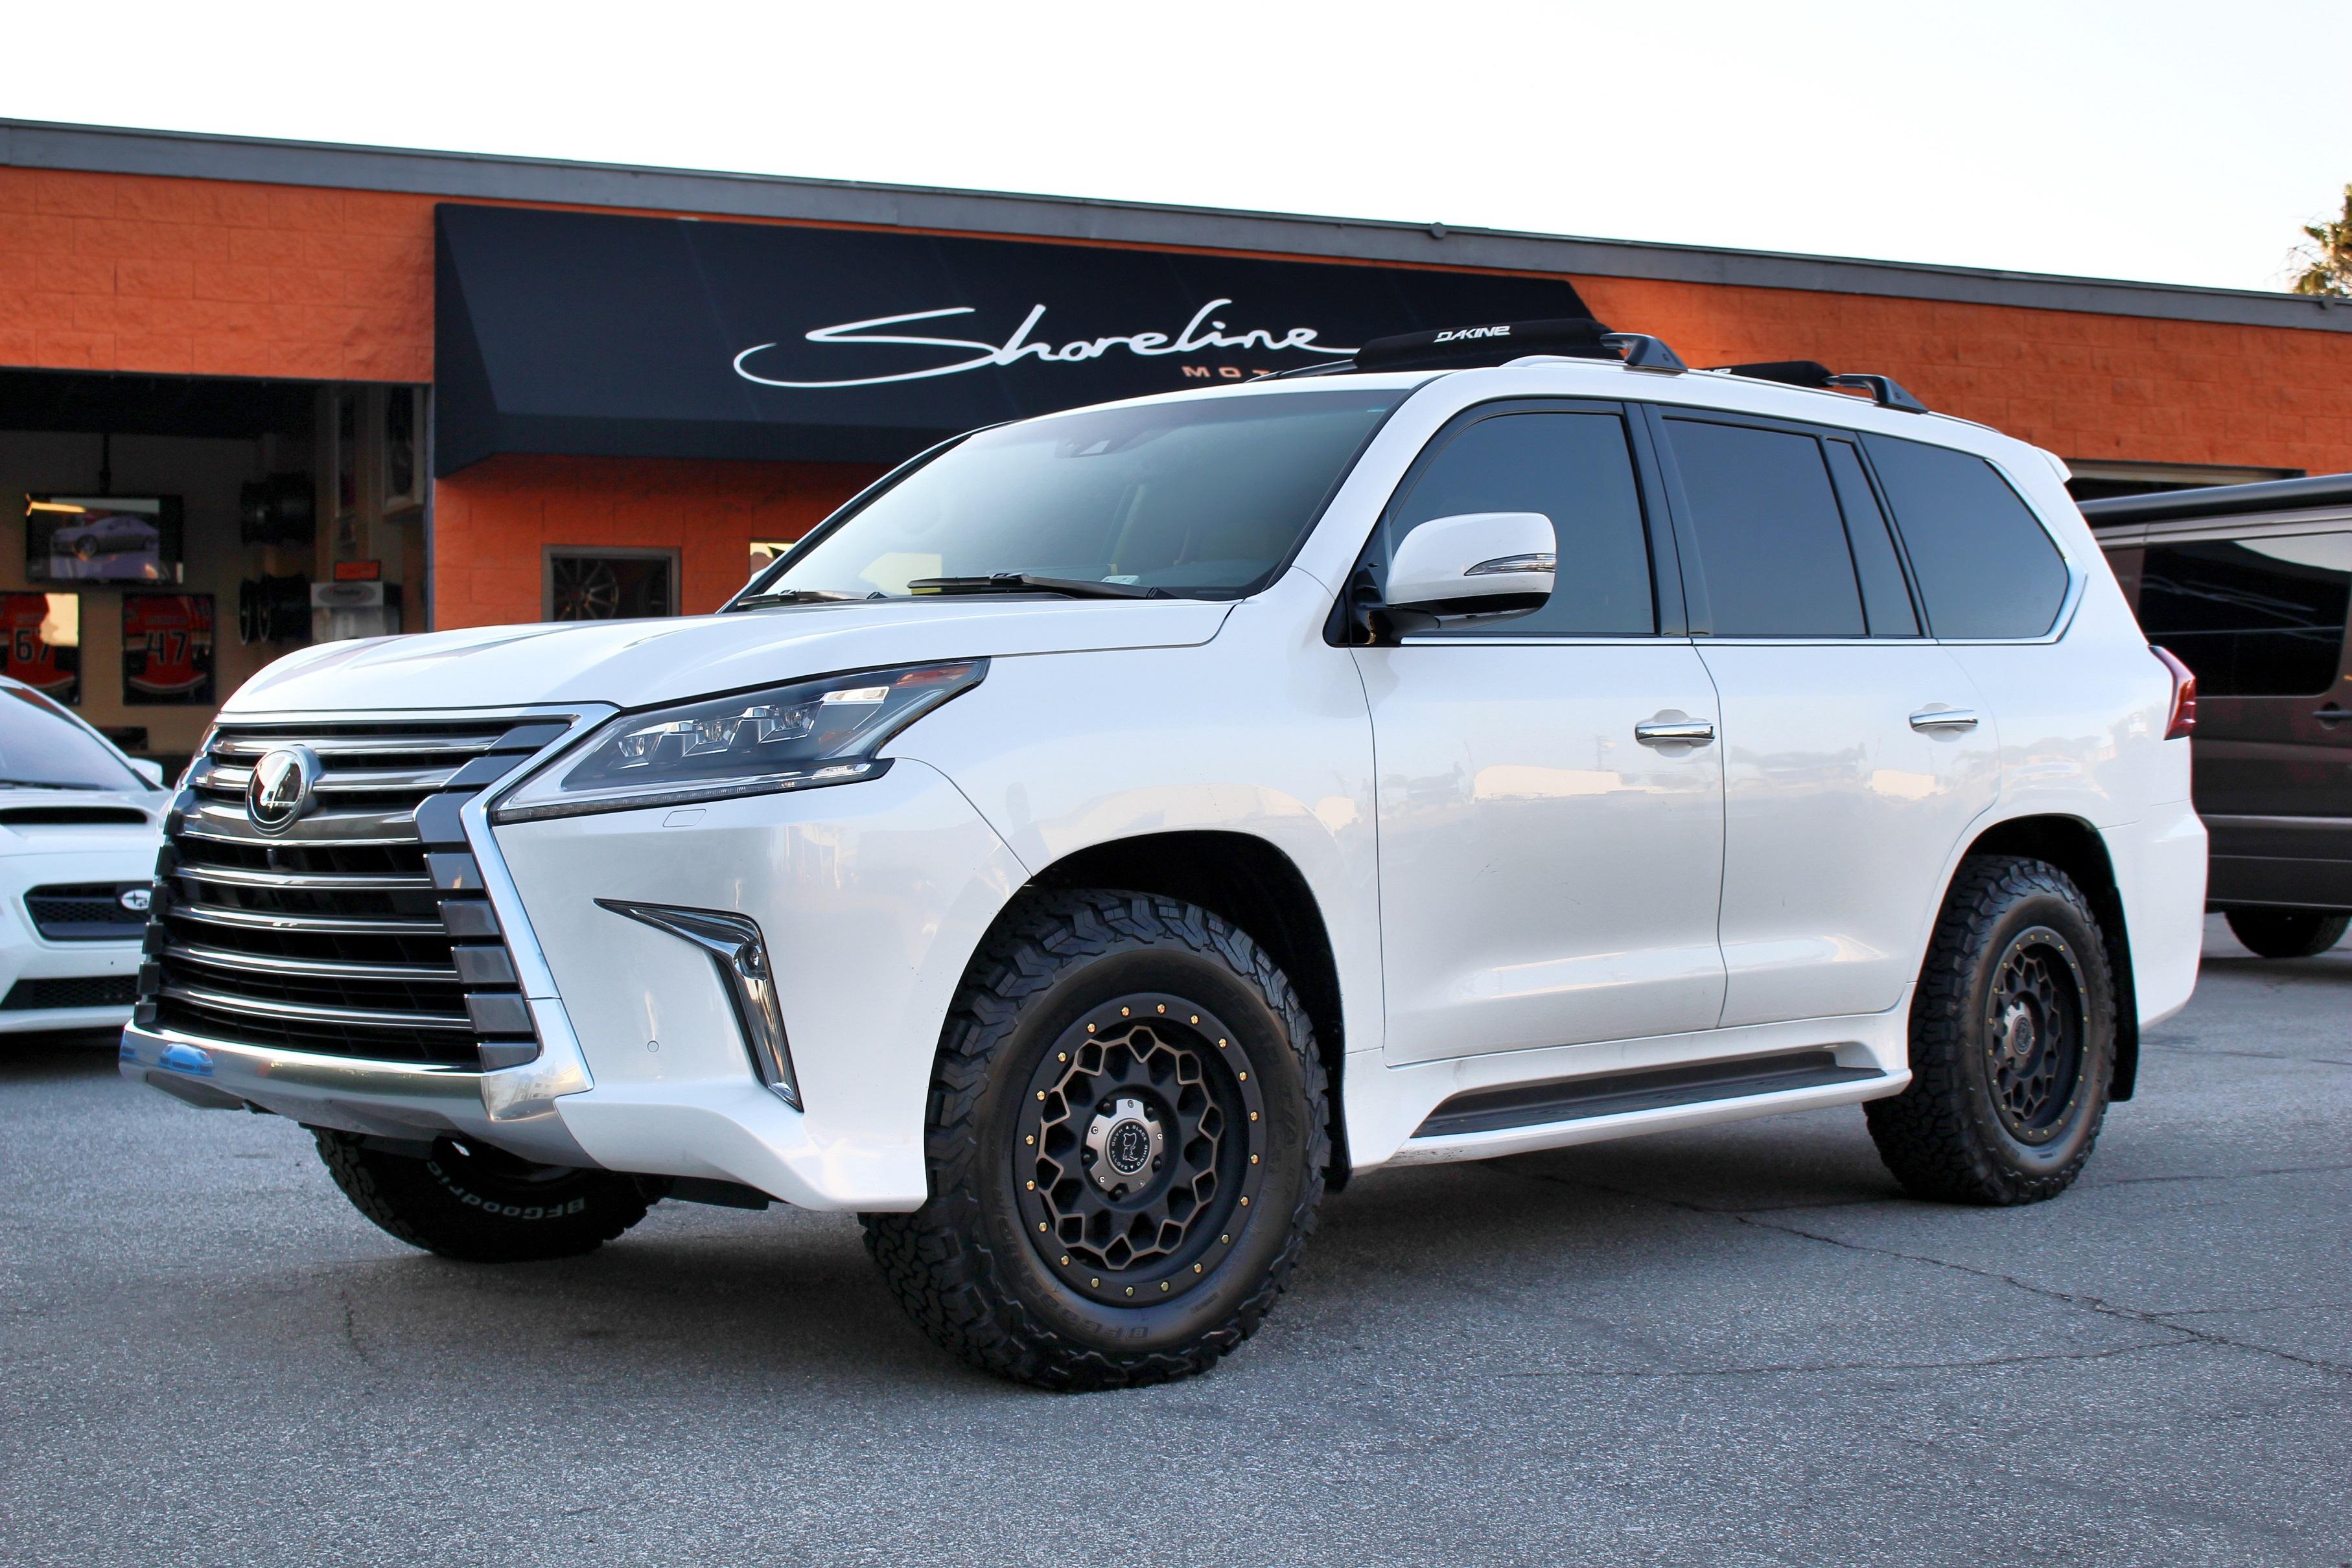 Black Rhino Truck Wheels Introduces the Diamante